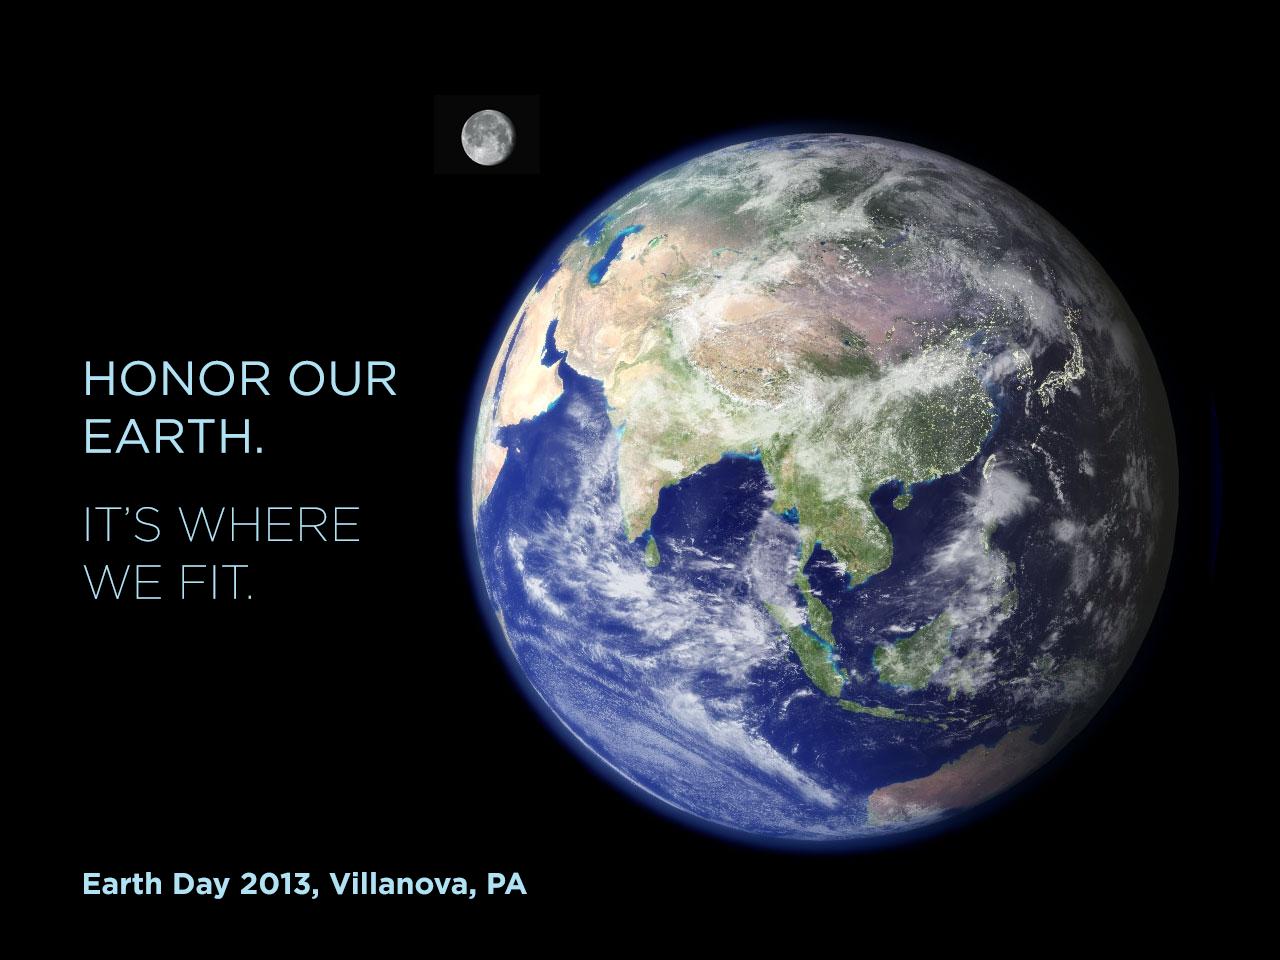 Villanova's 43rd Earth Day Celebration to be Held April 22, 2013